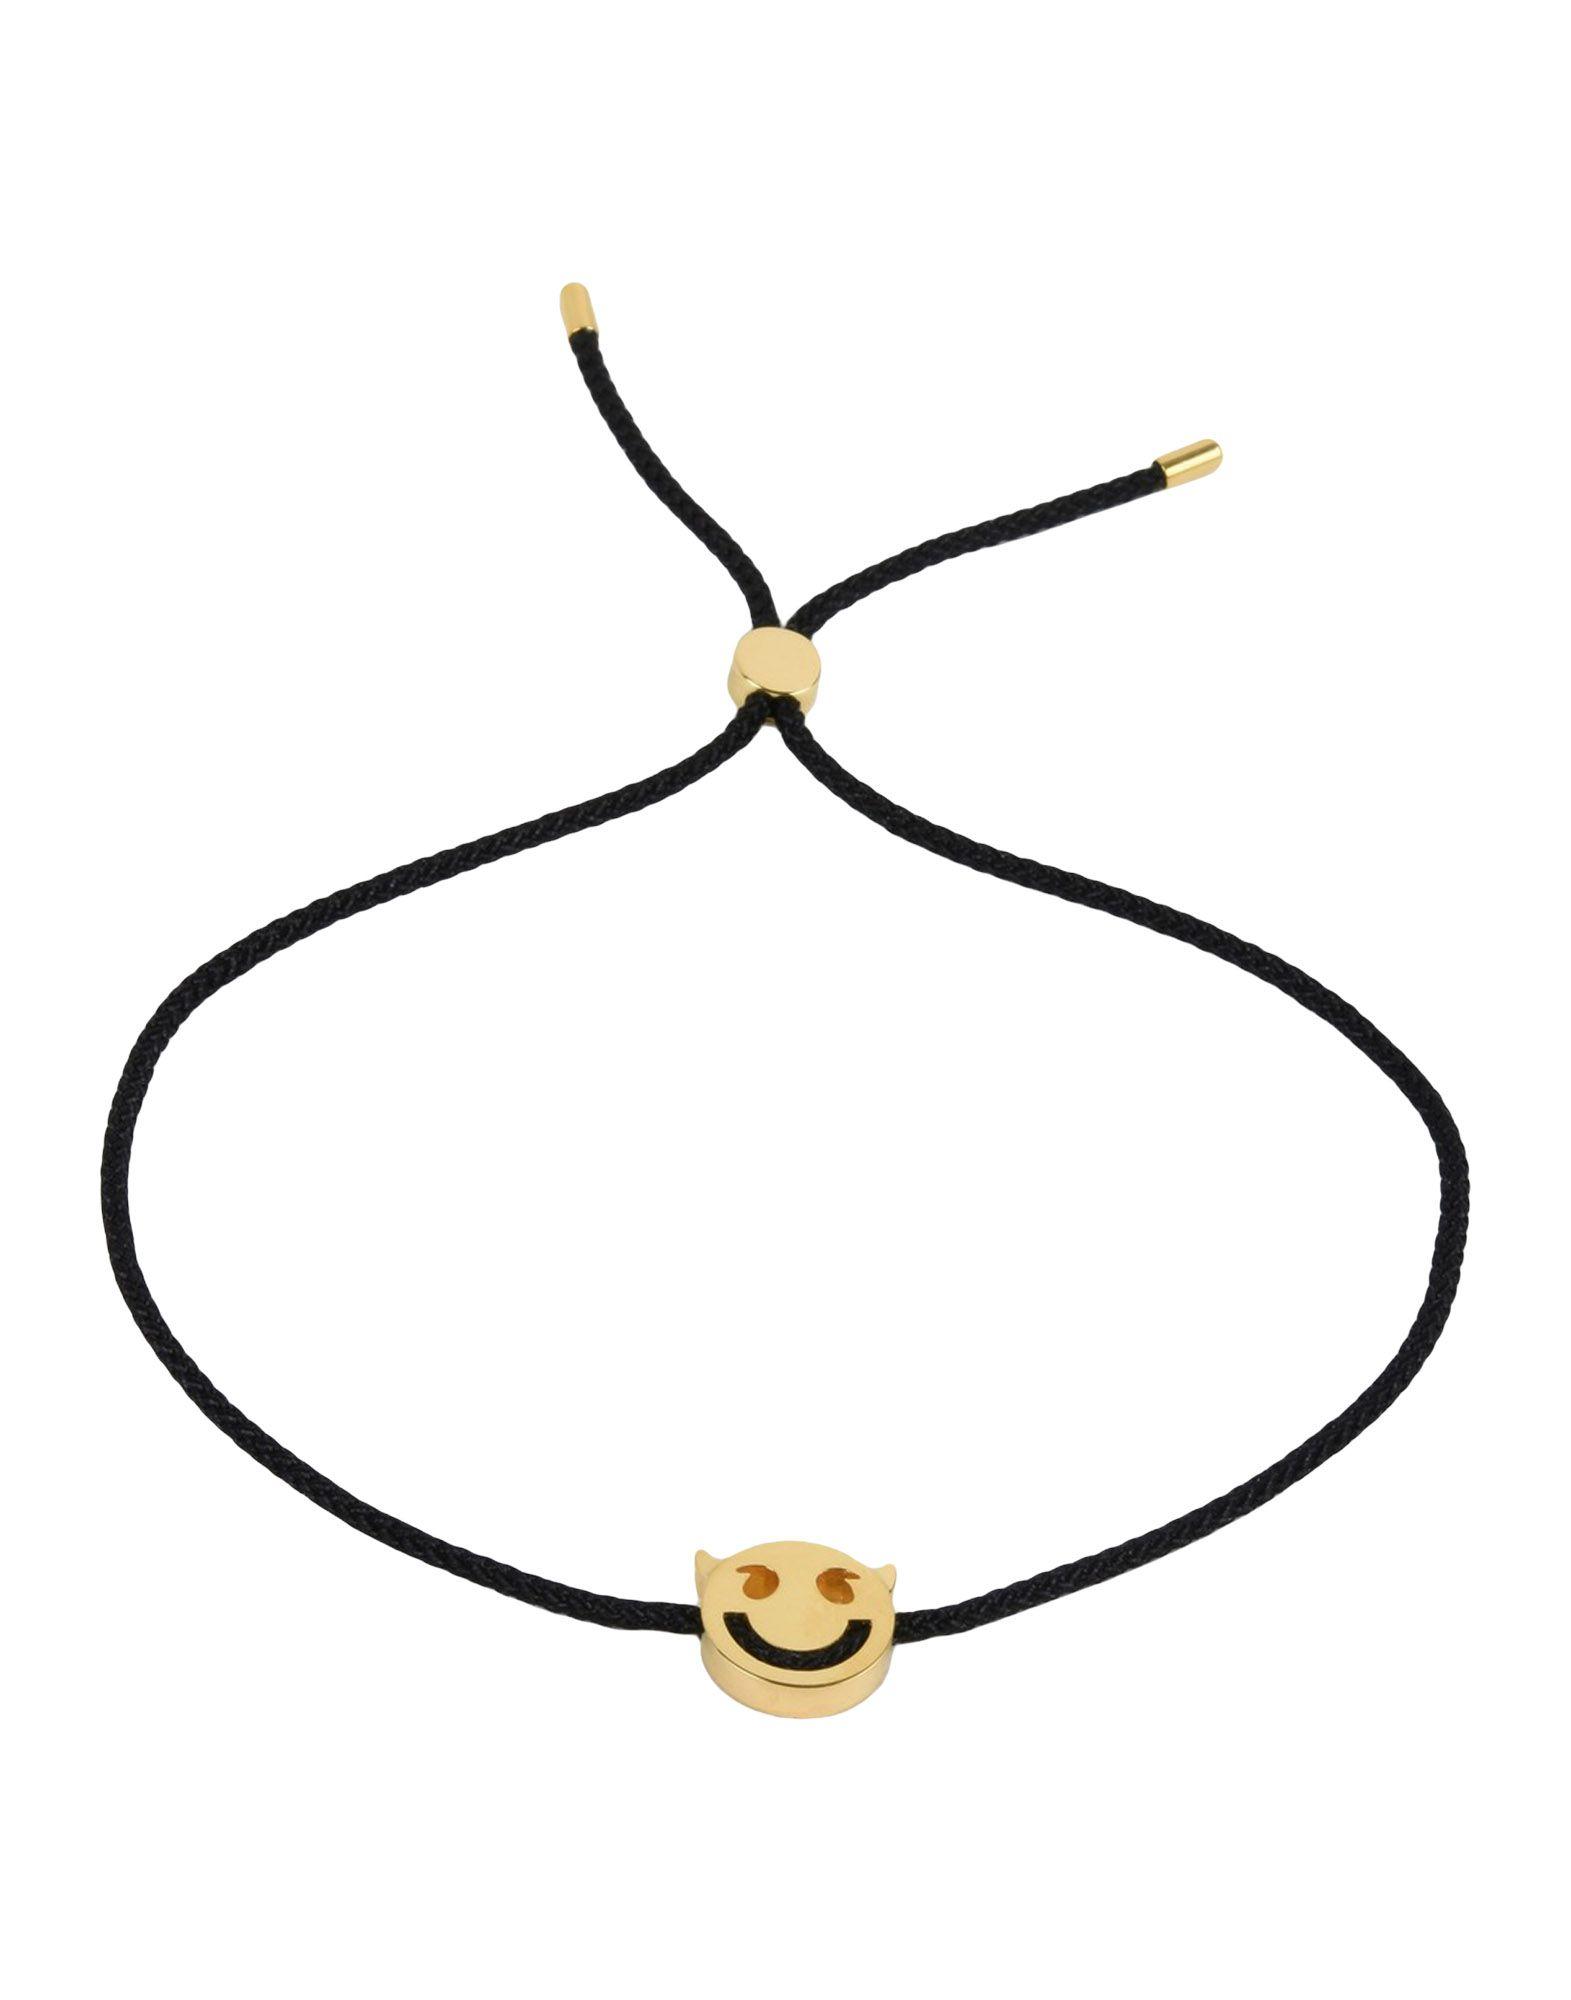 Bracciale Ruifier Friends Wicked Bracelet_Black - Uomo - Acquista online su